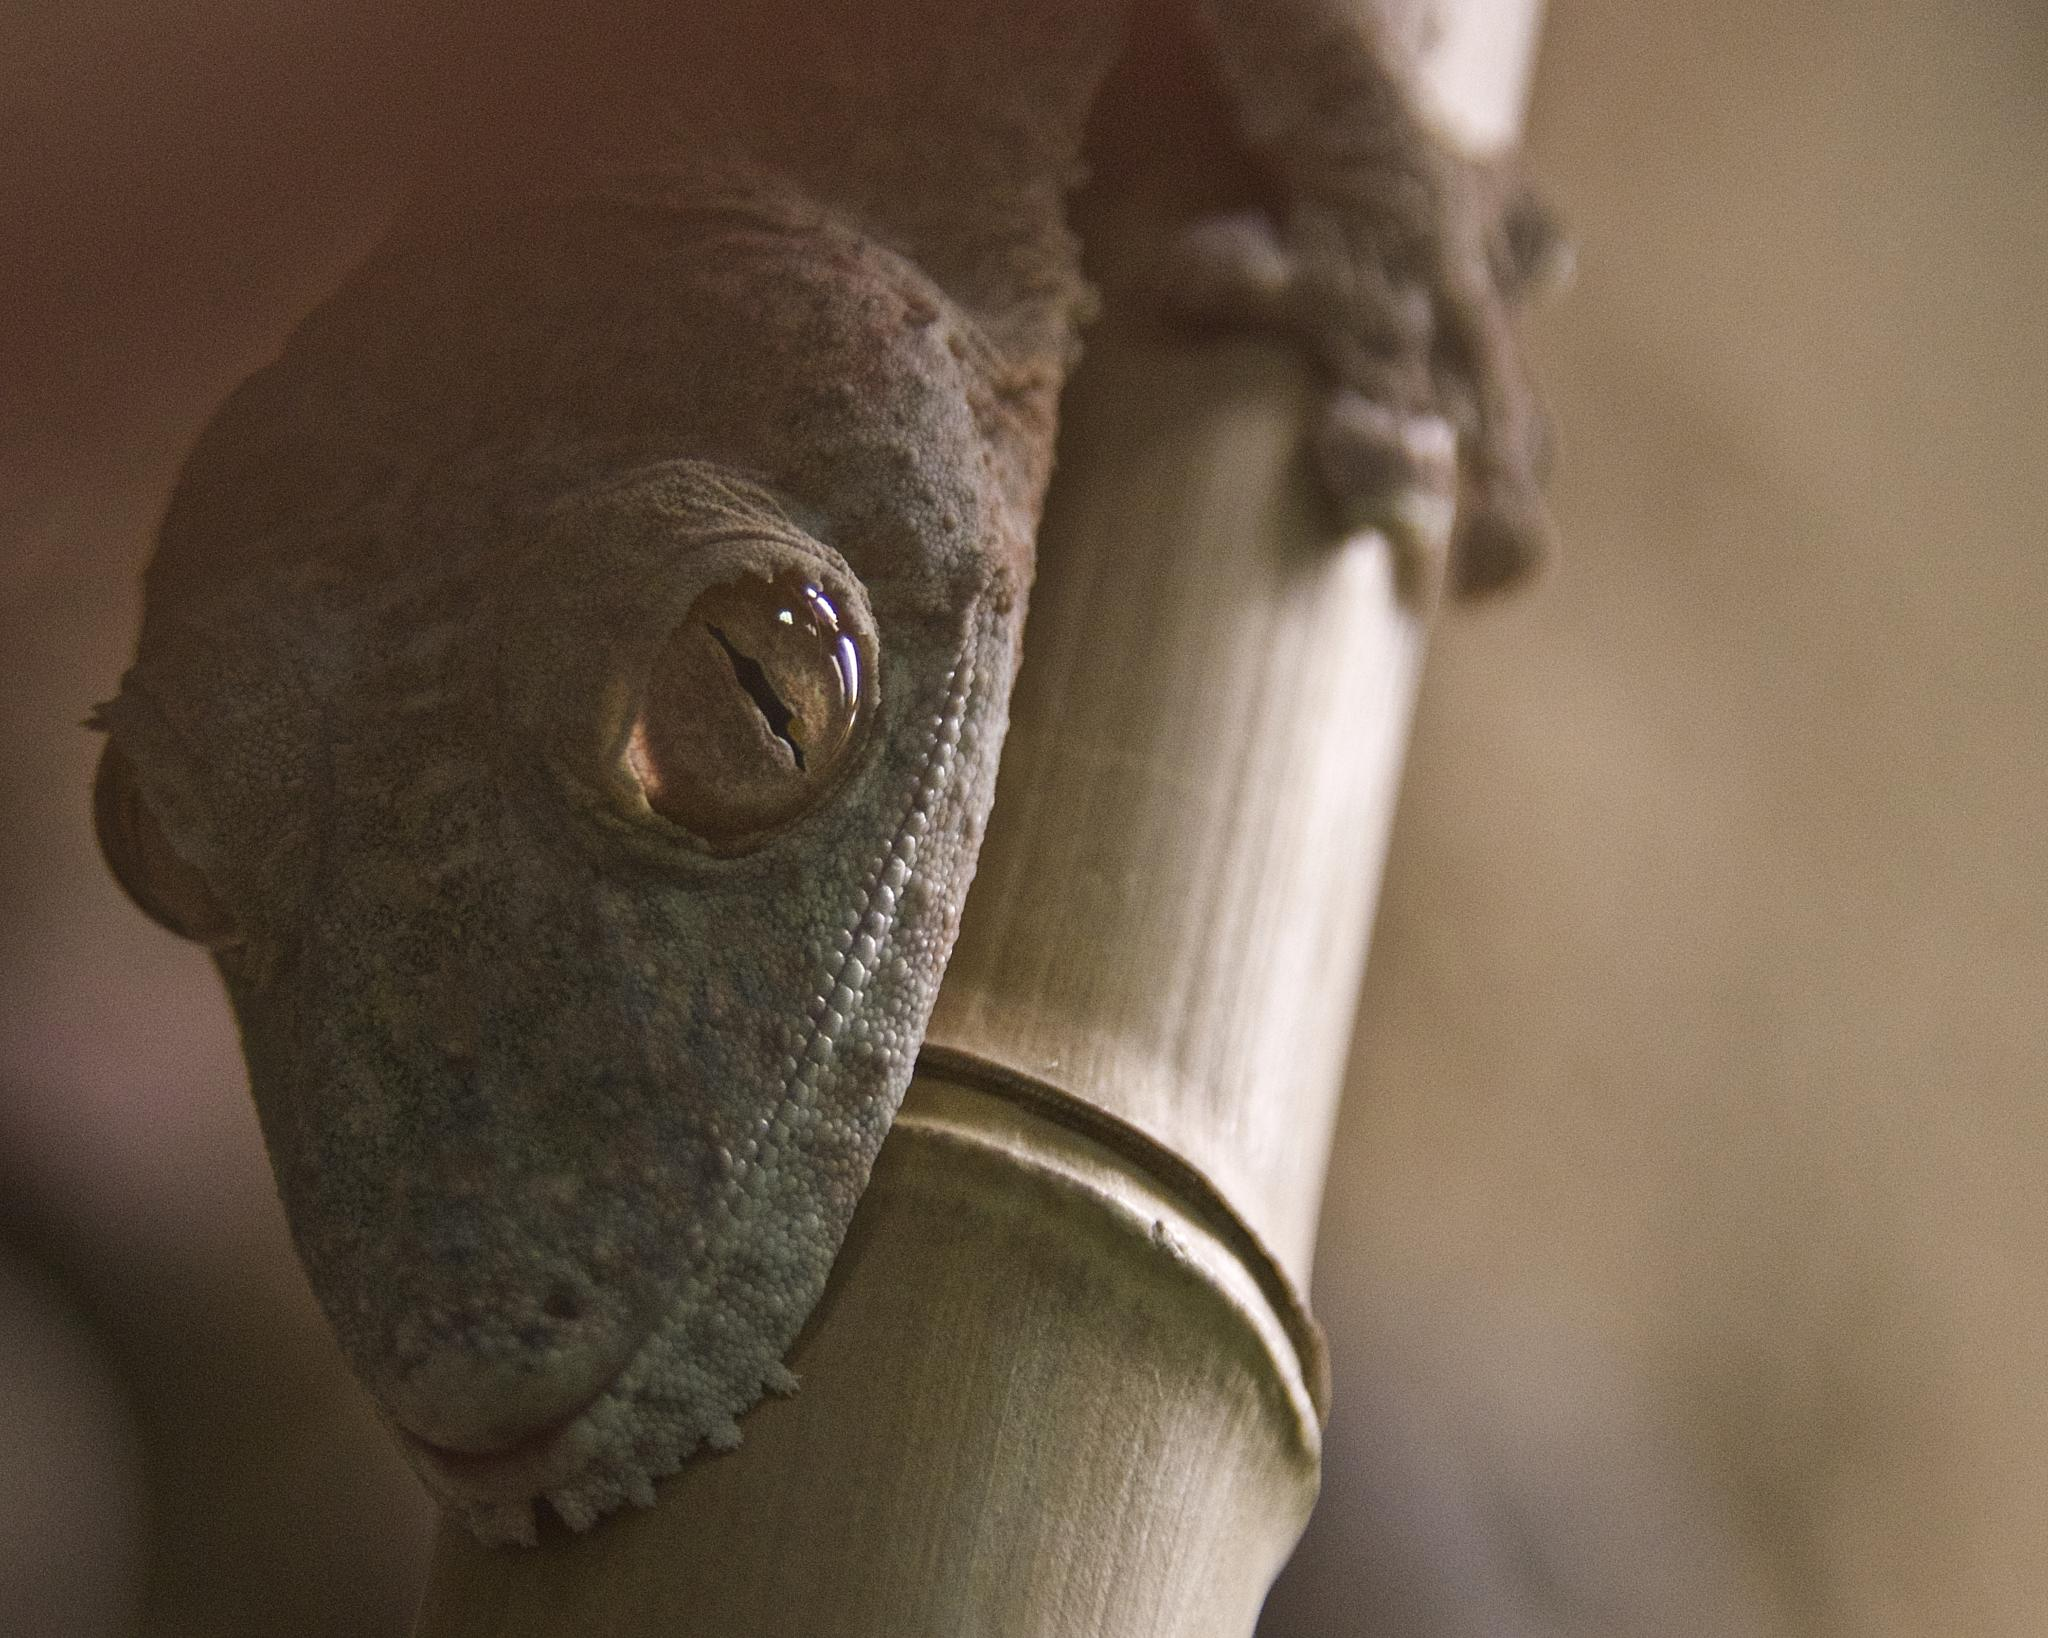 Hanging Eye by Steve Aicinena